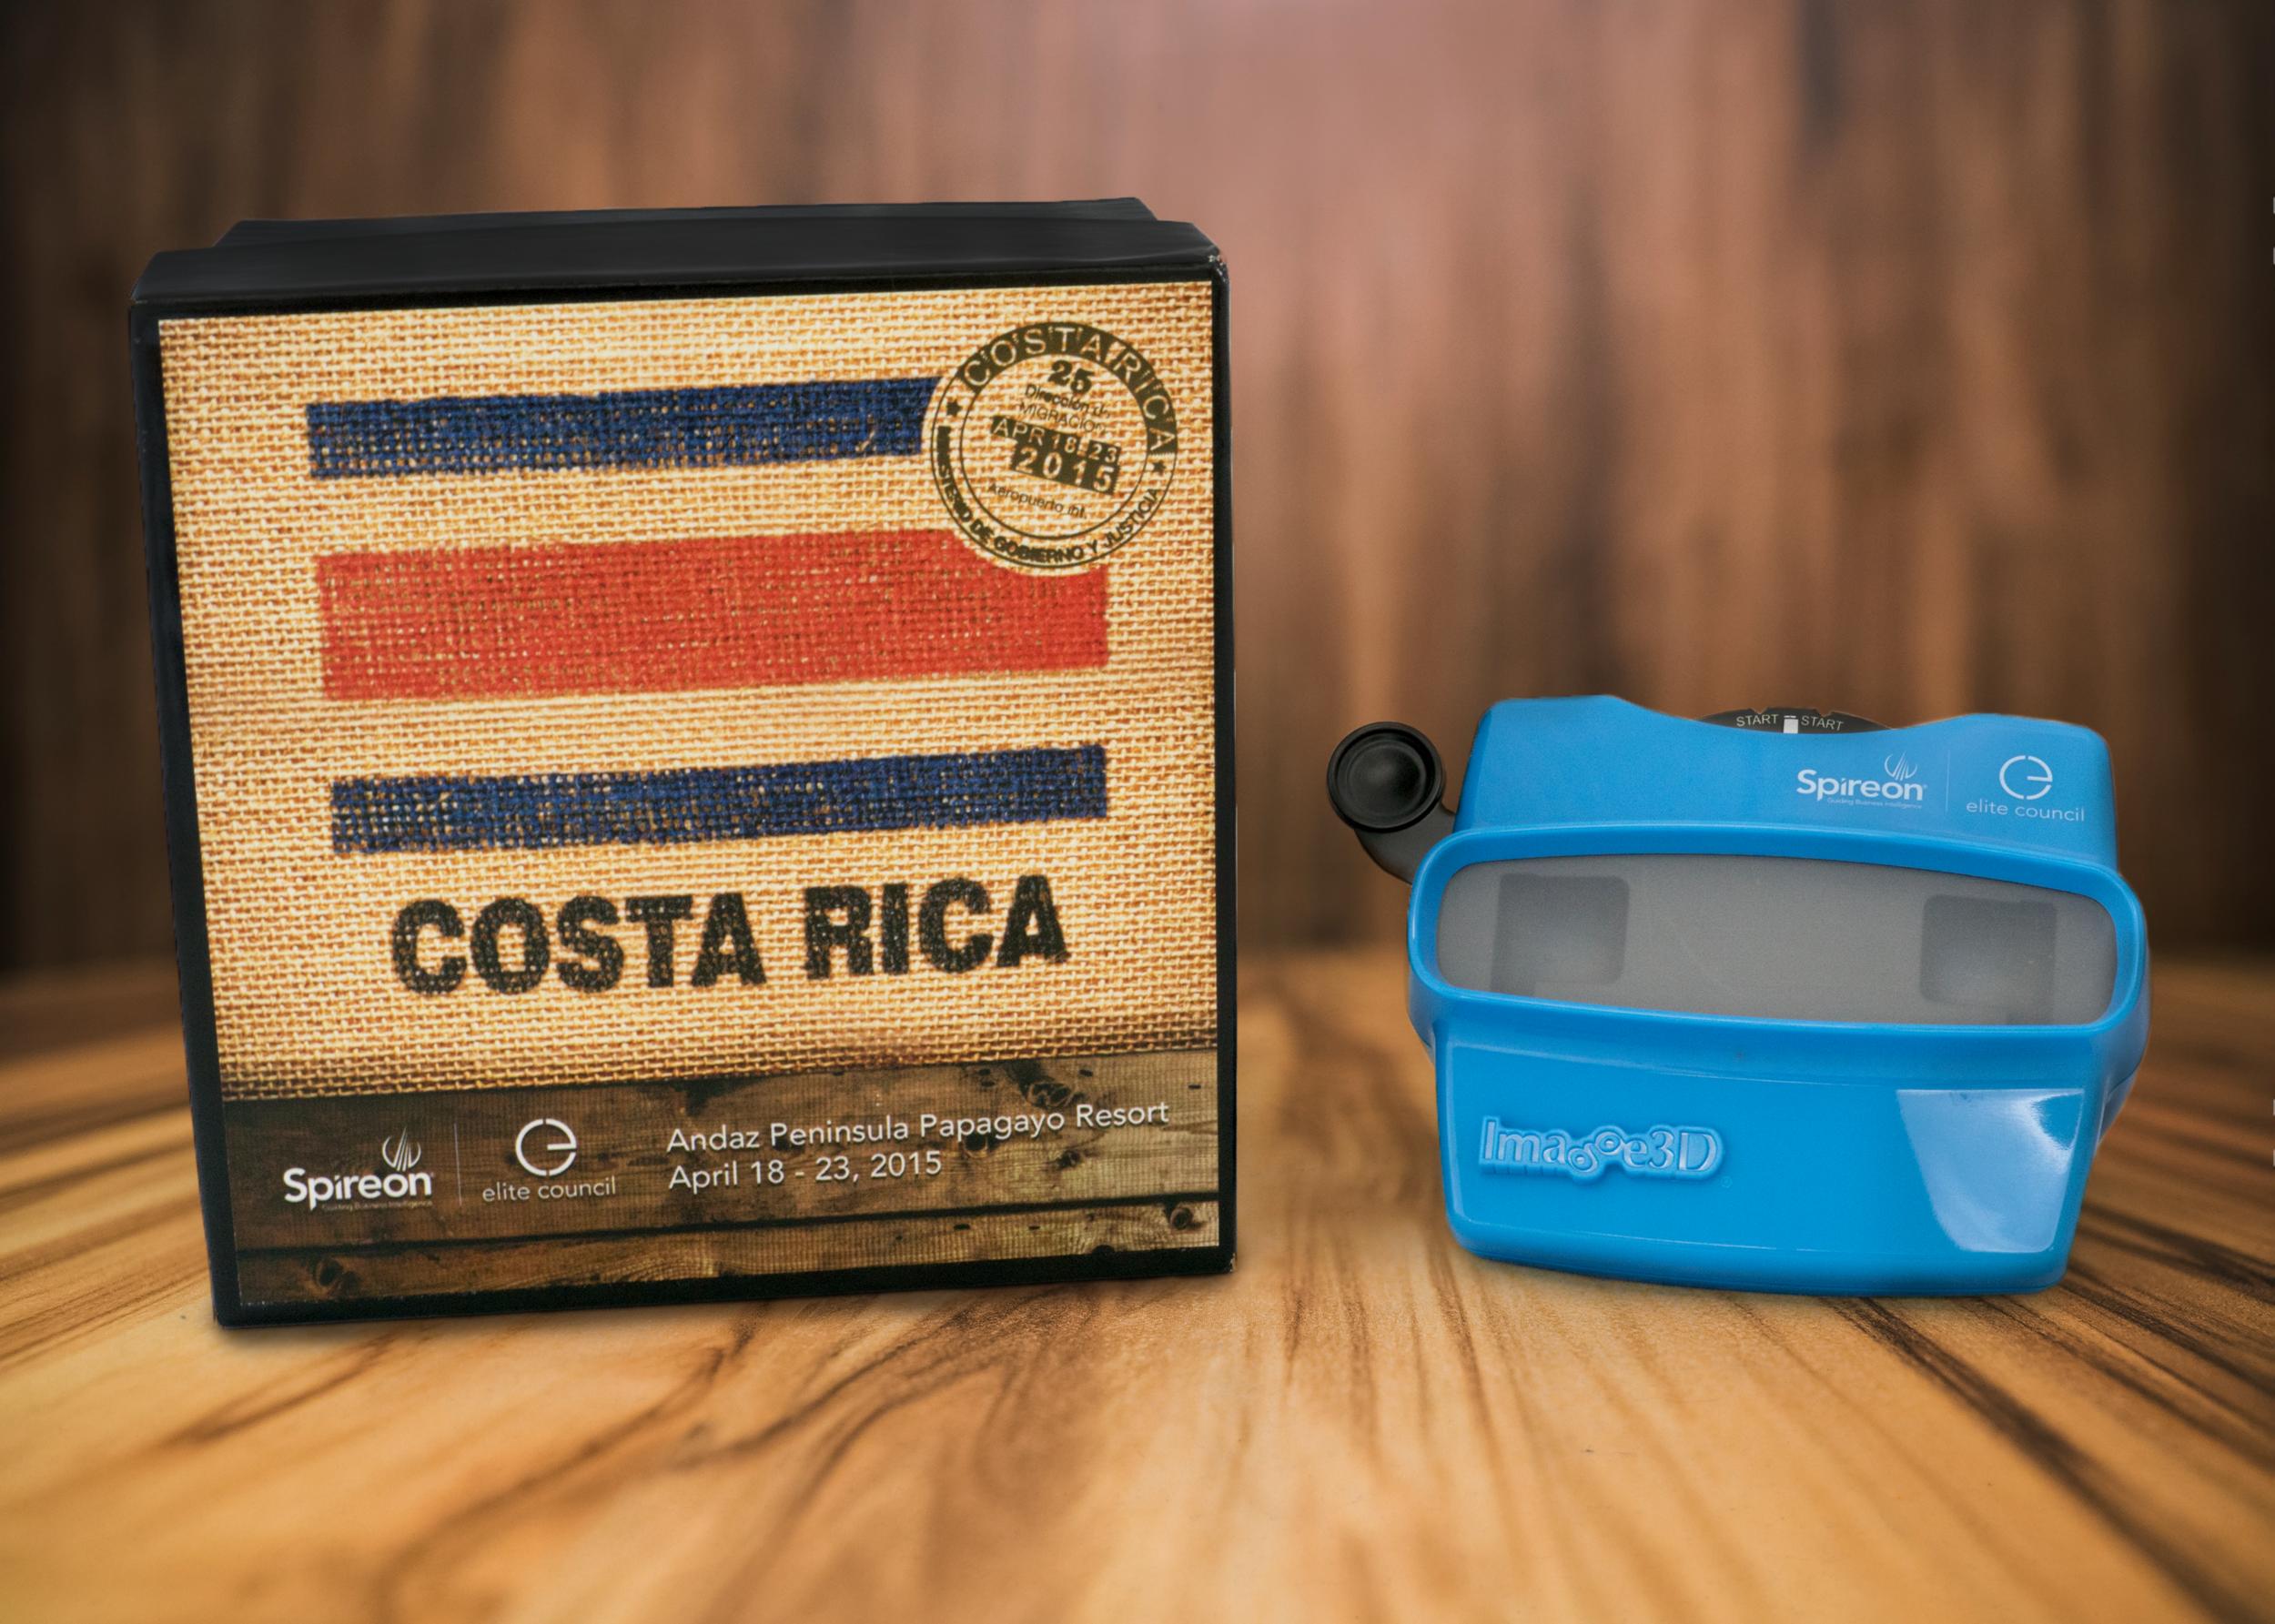 Spireon Costa Rica View Finder